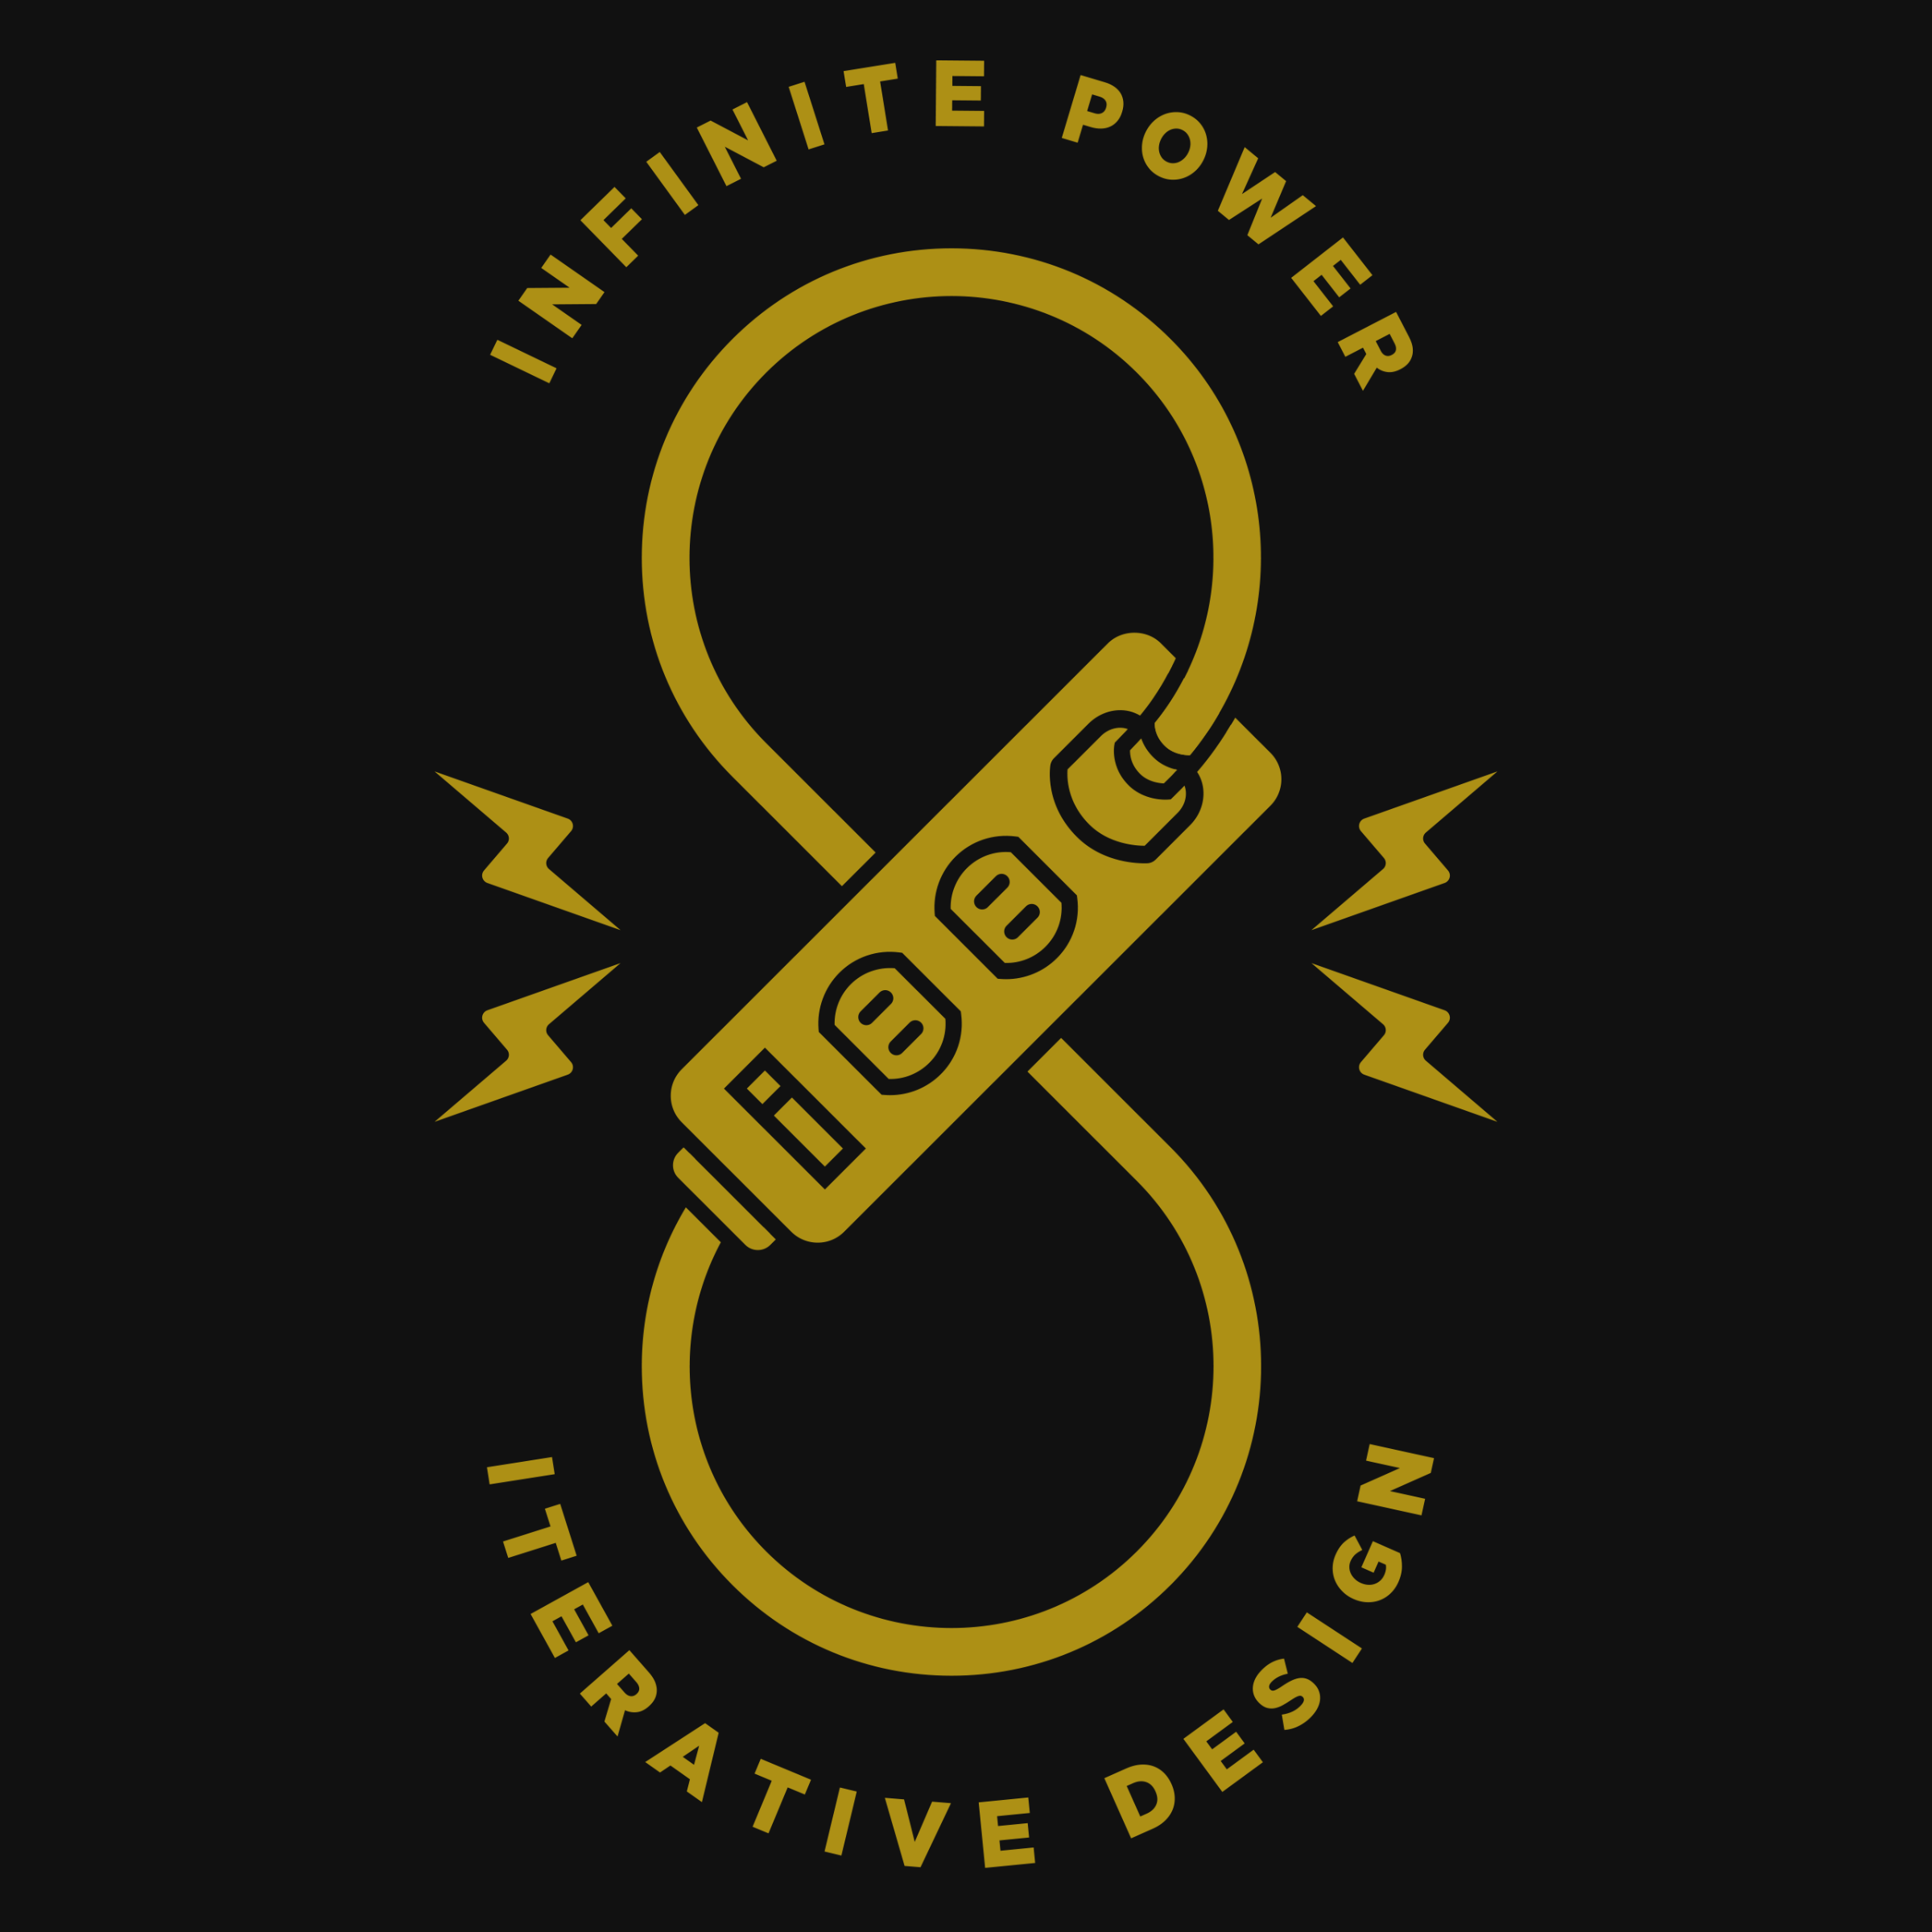 Infinite Power, Iterative Design